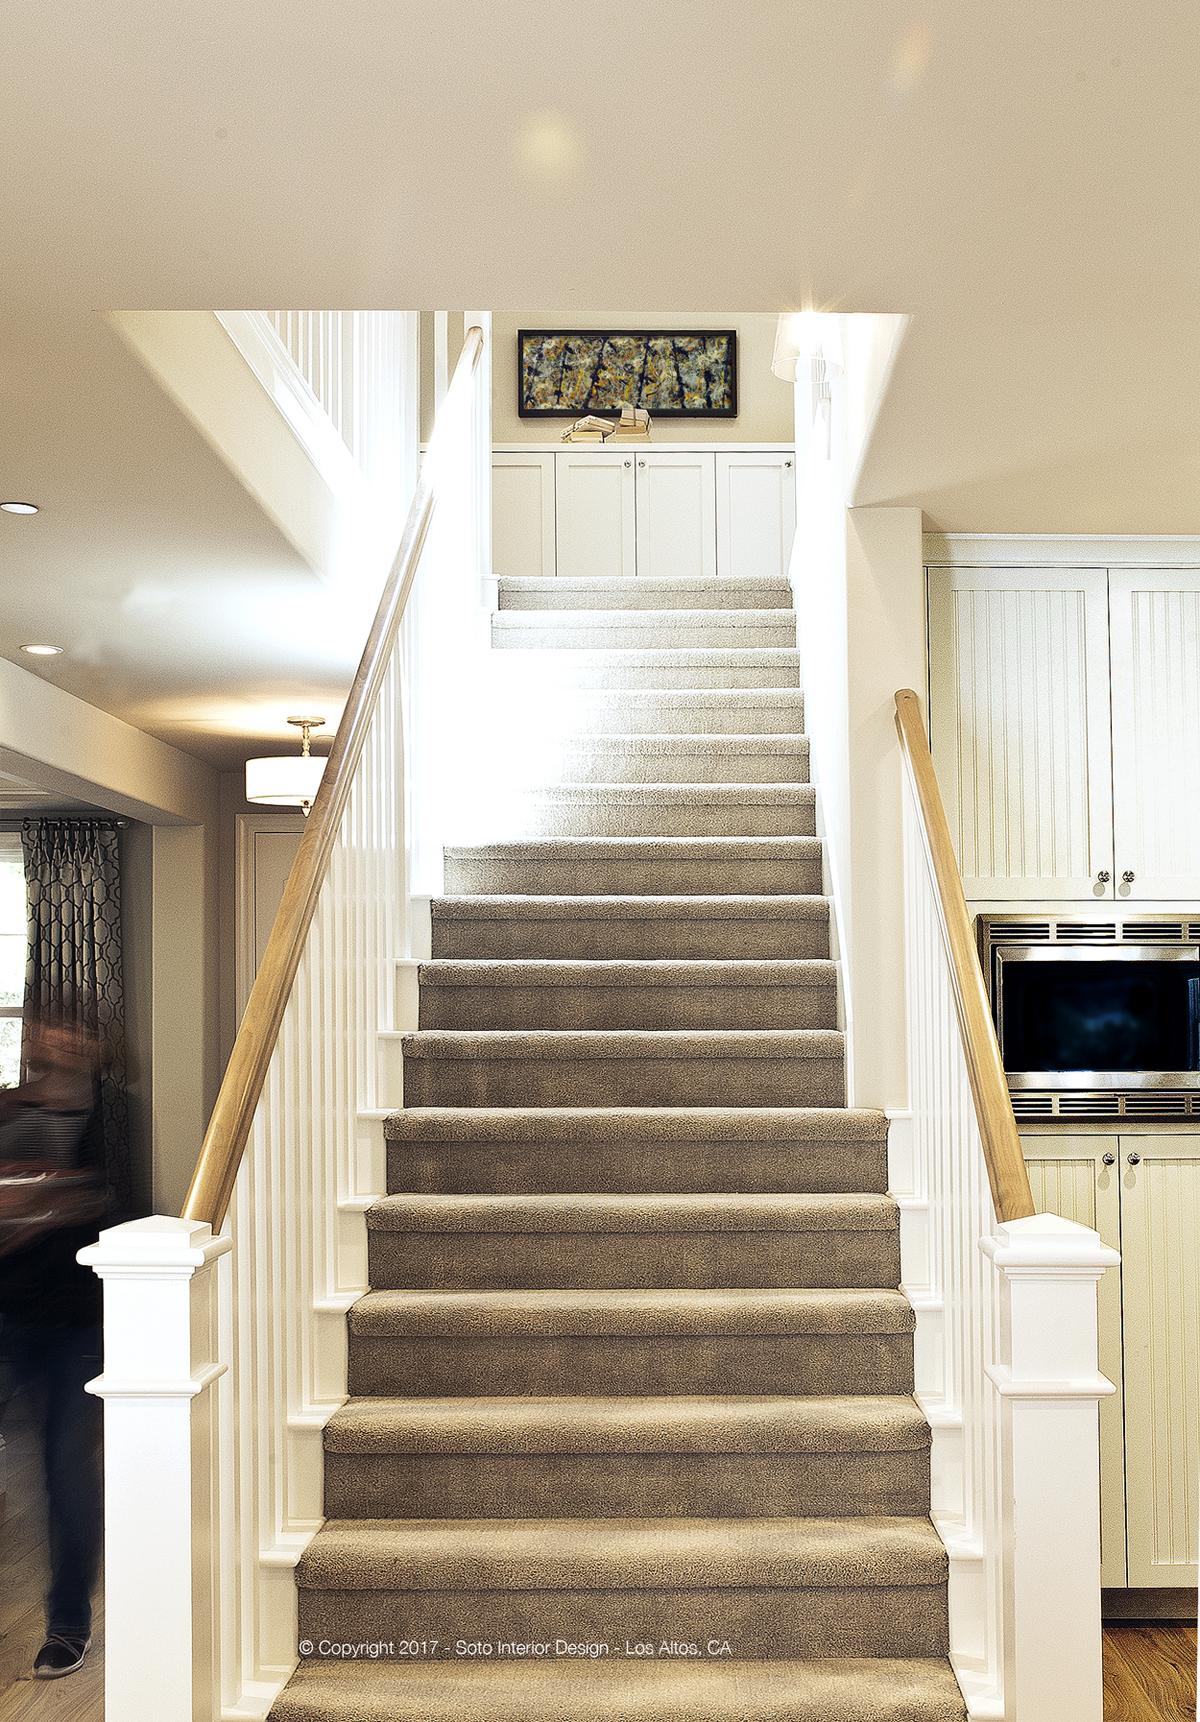 Lot-7-stairs-B.jpg